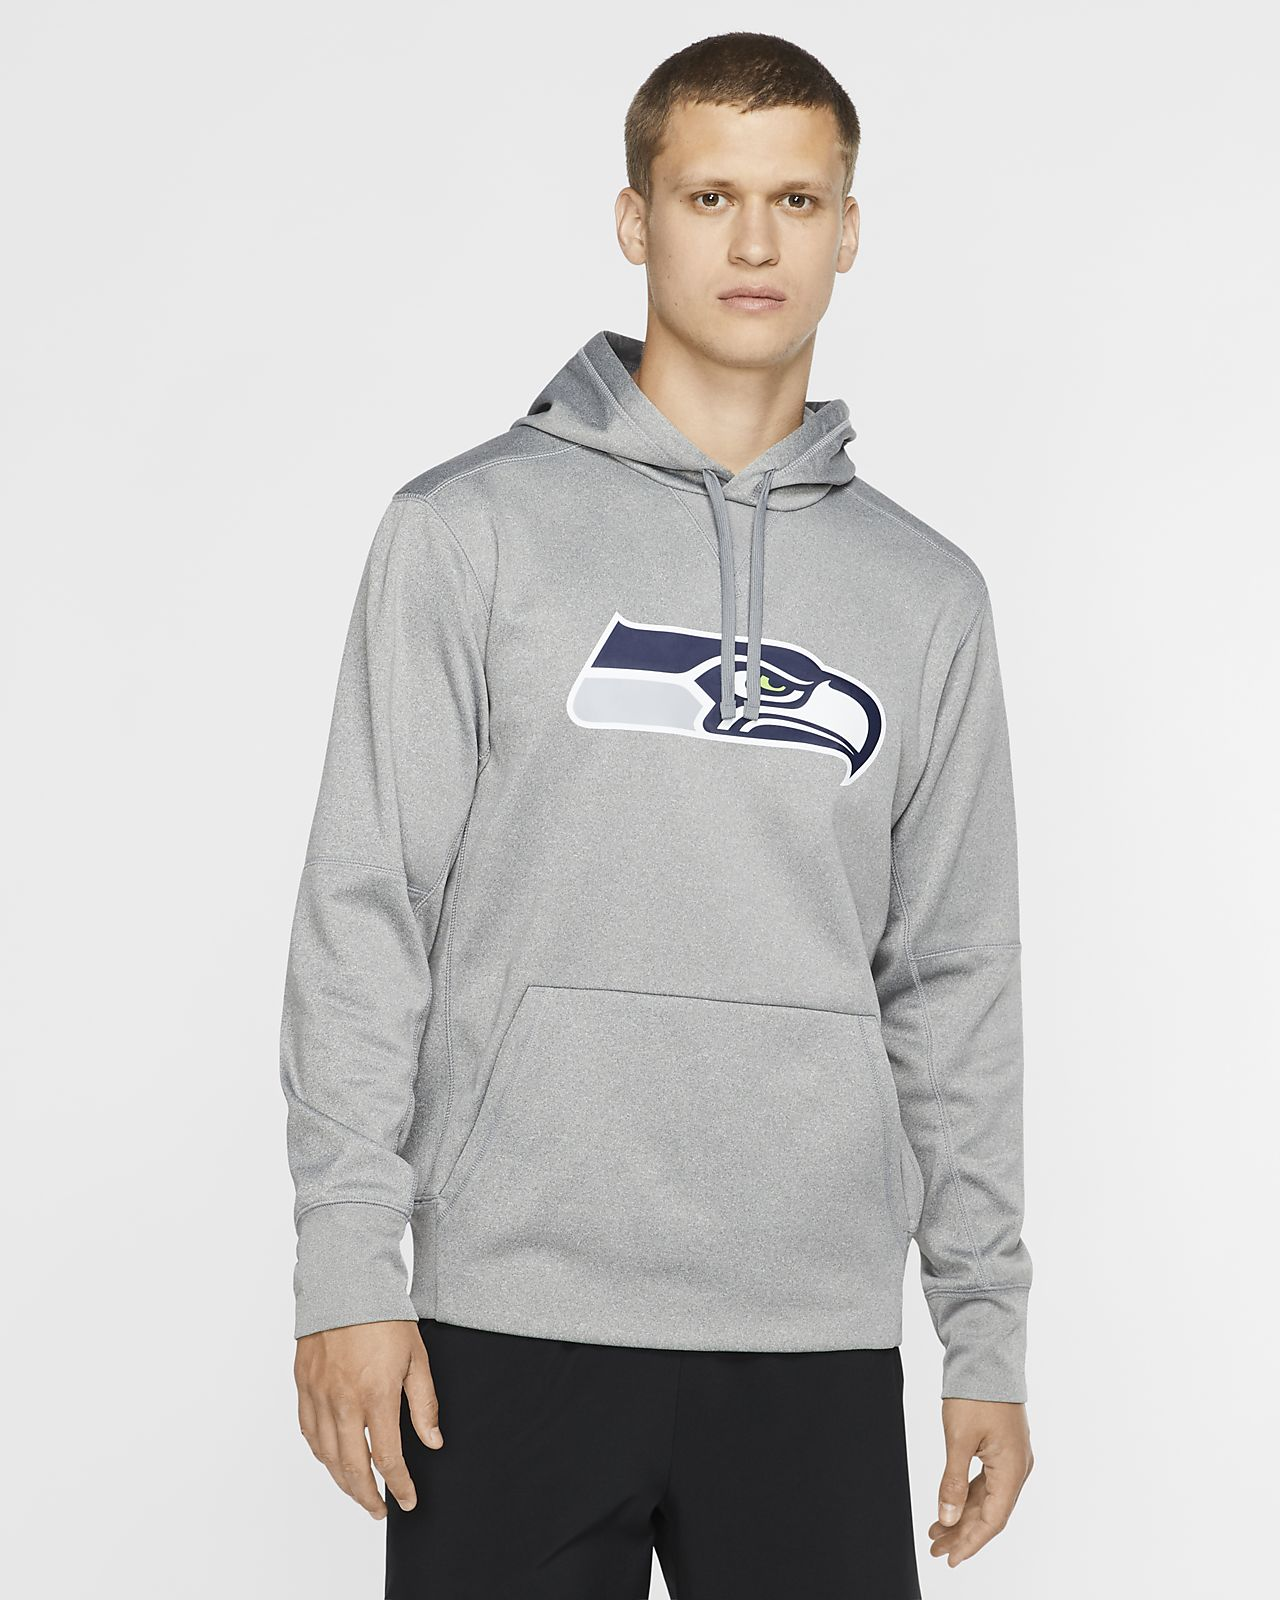 Felpa pullover con cappuccio Nike Circuit Logo Essential (NFL Seahawks) - Uomo